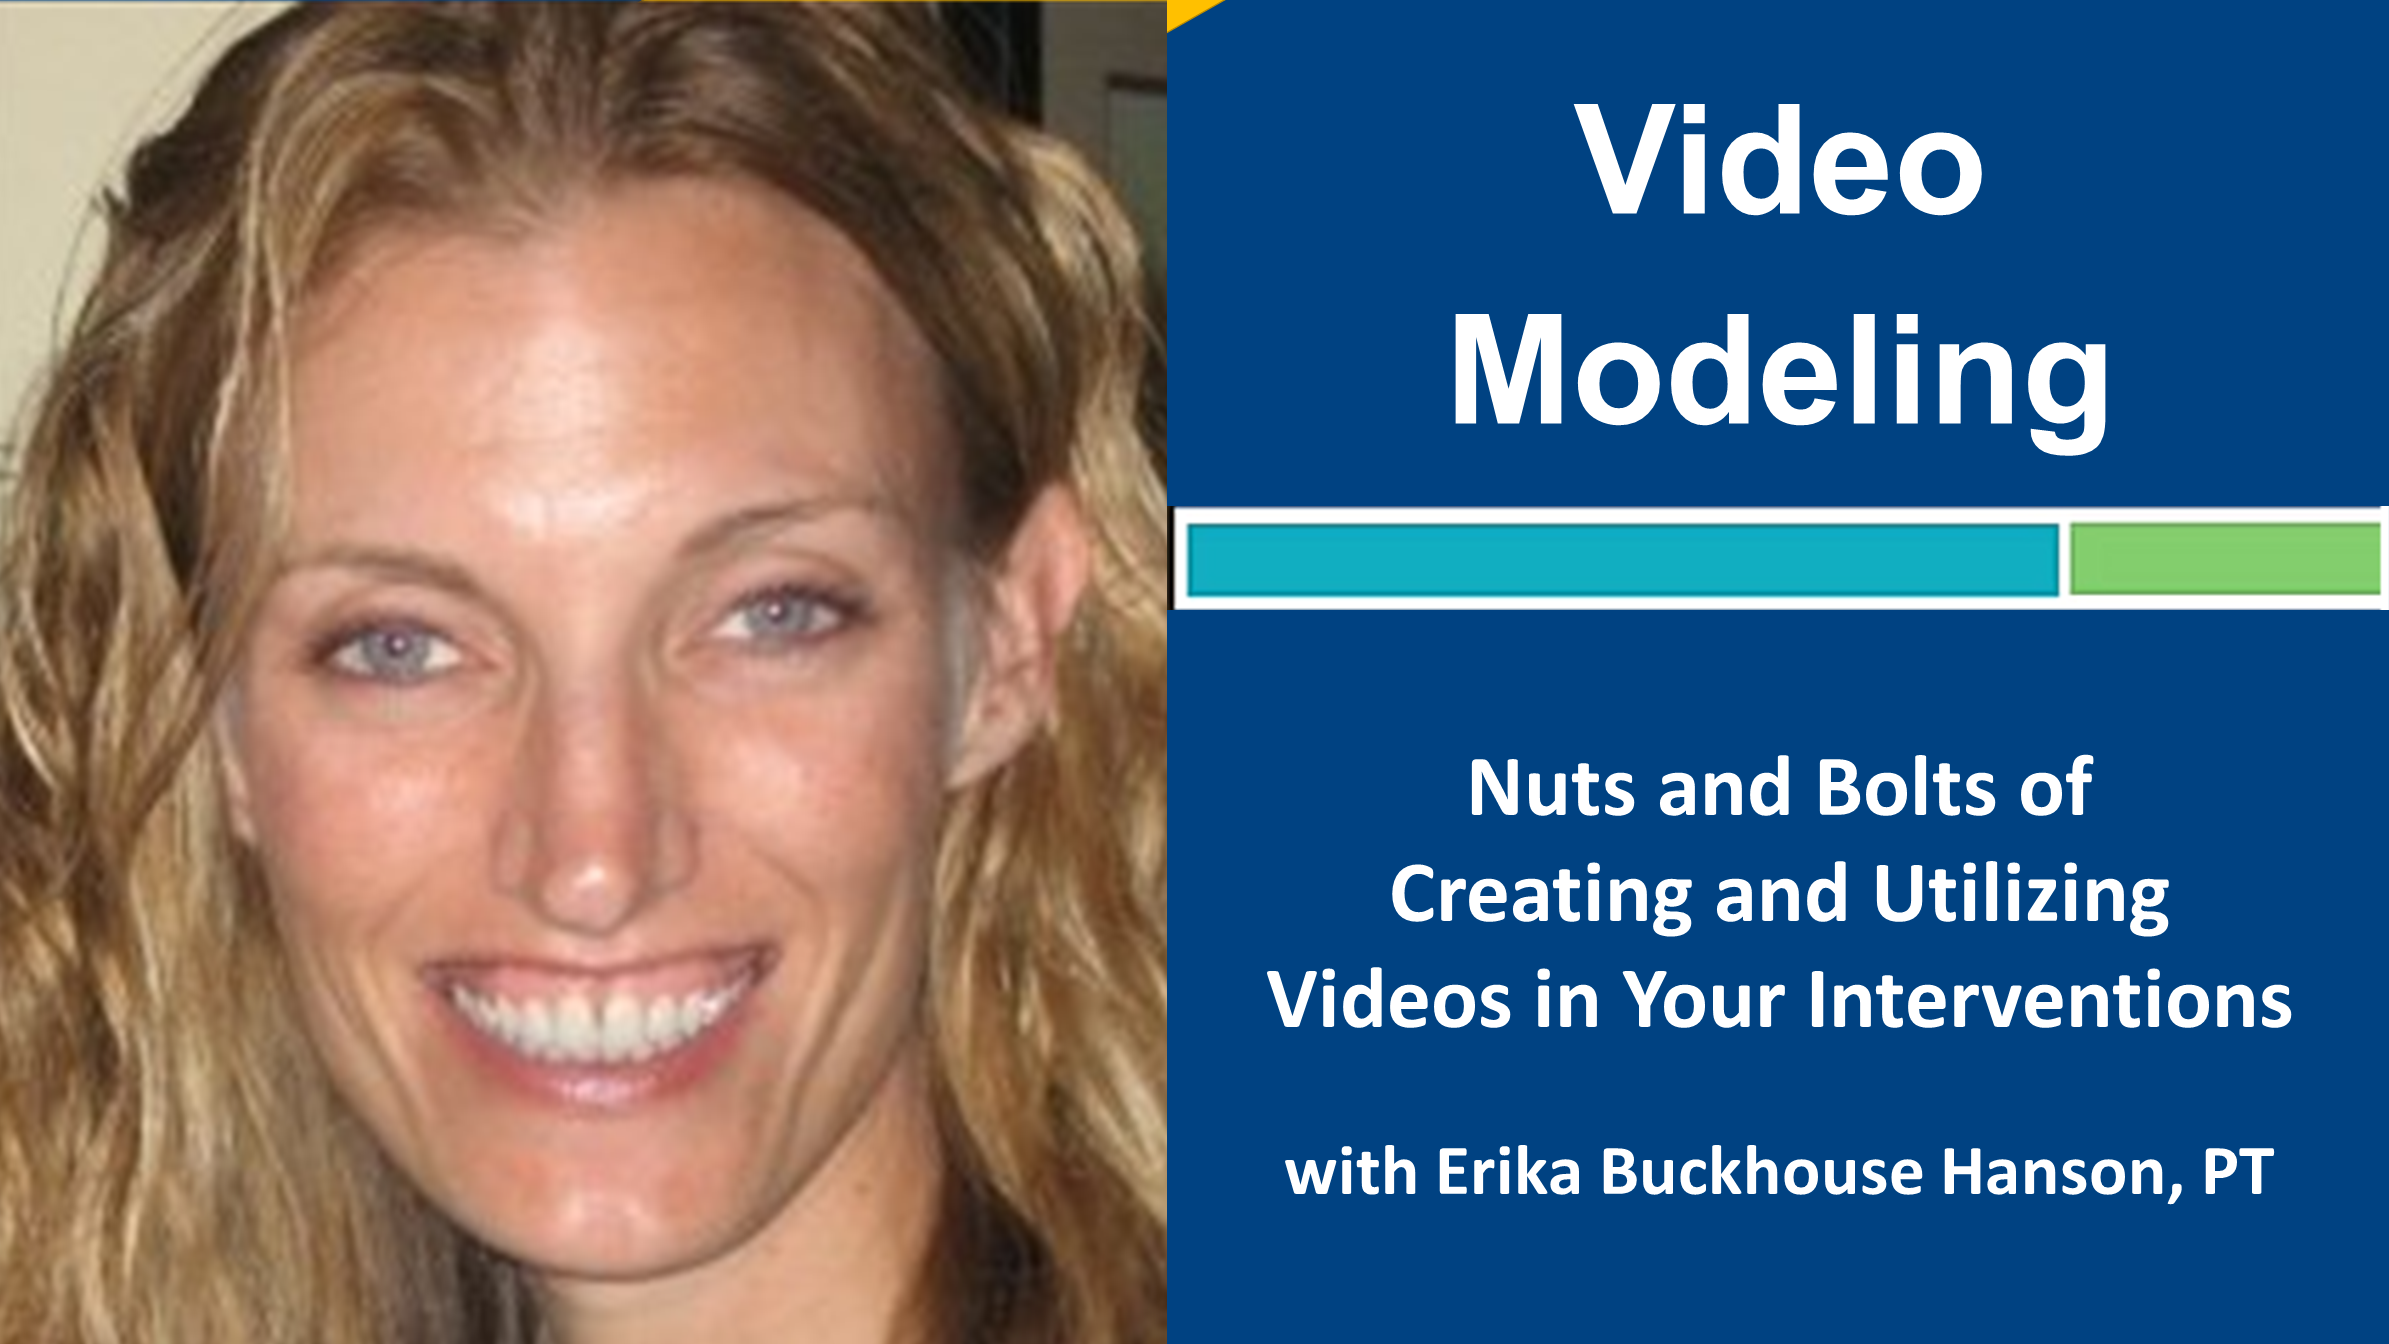 Webinar 5: Video Modeling with Erika Buckhouse Hanson, PT